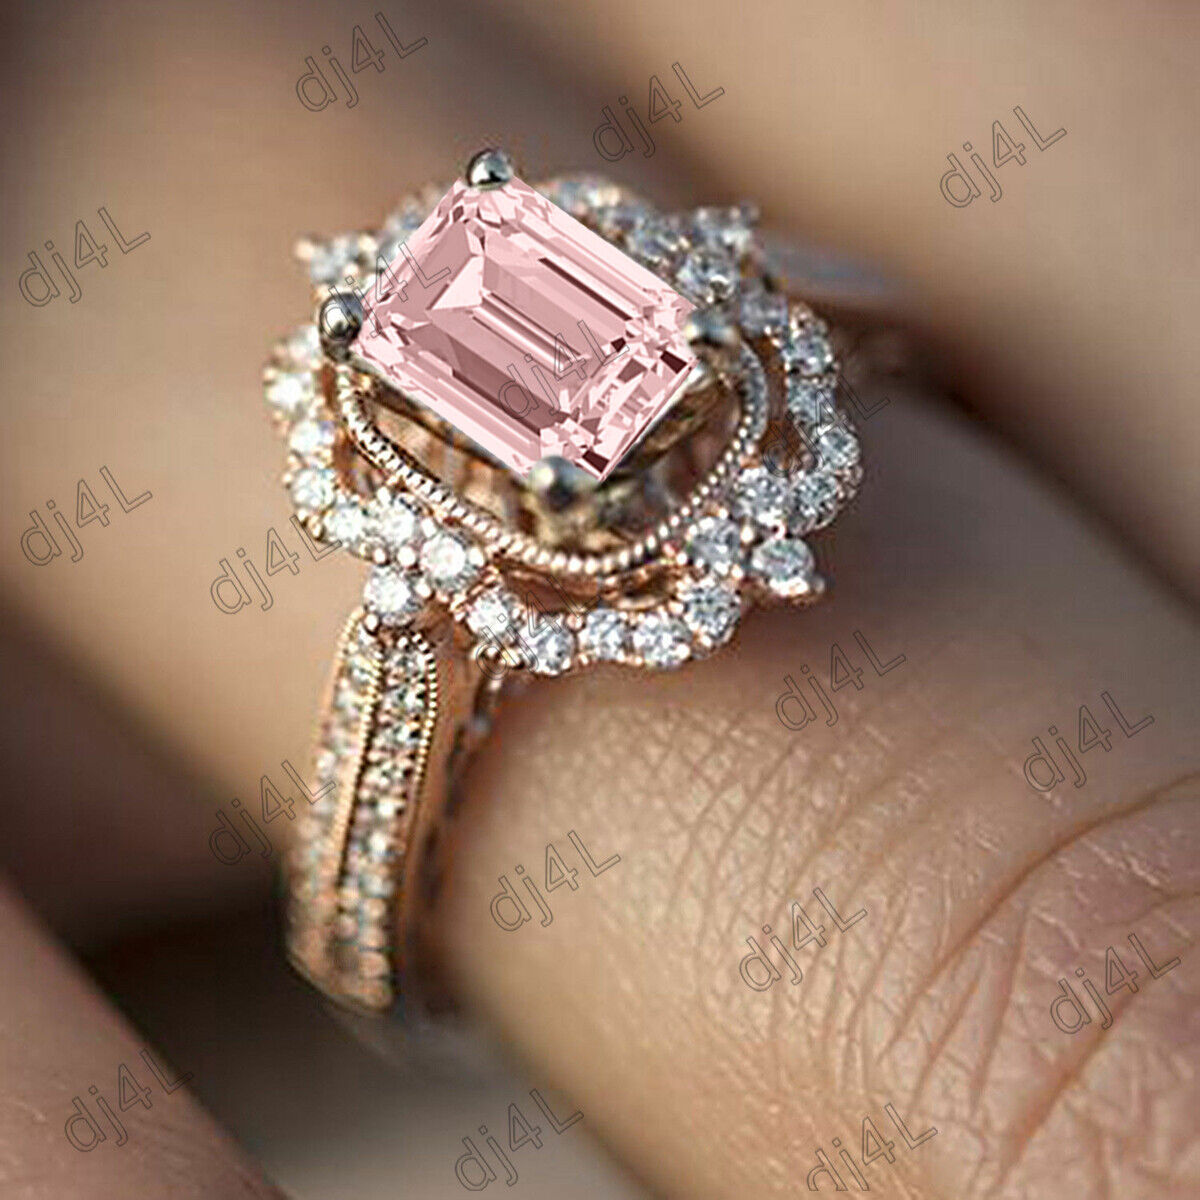 2.50Ct Morganite Emerald Cut Diamond Halo Vintage Engagement Ring 10k pink gold